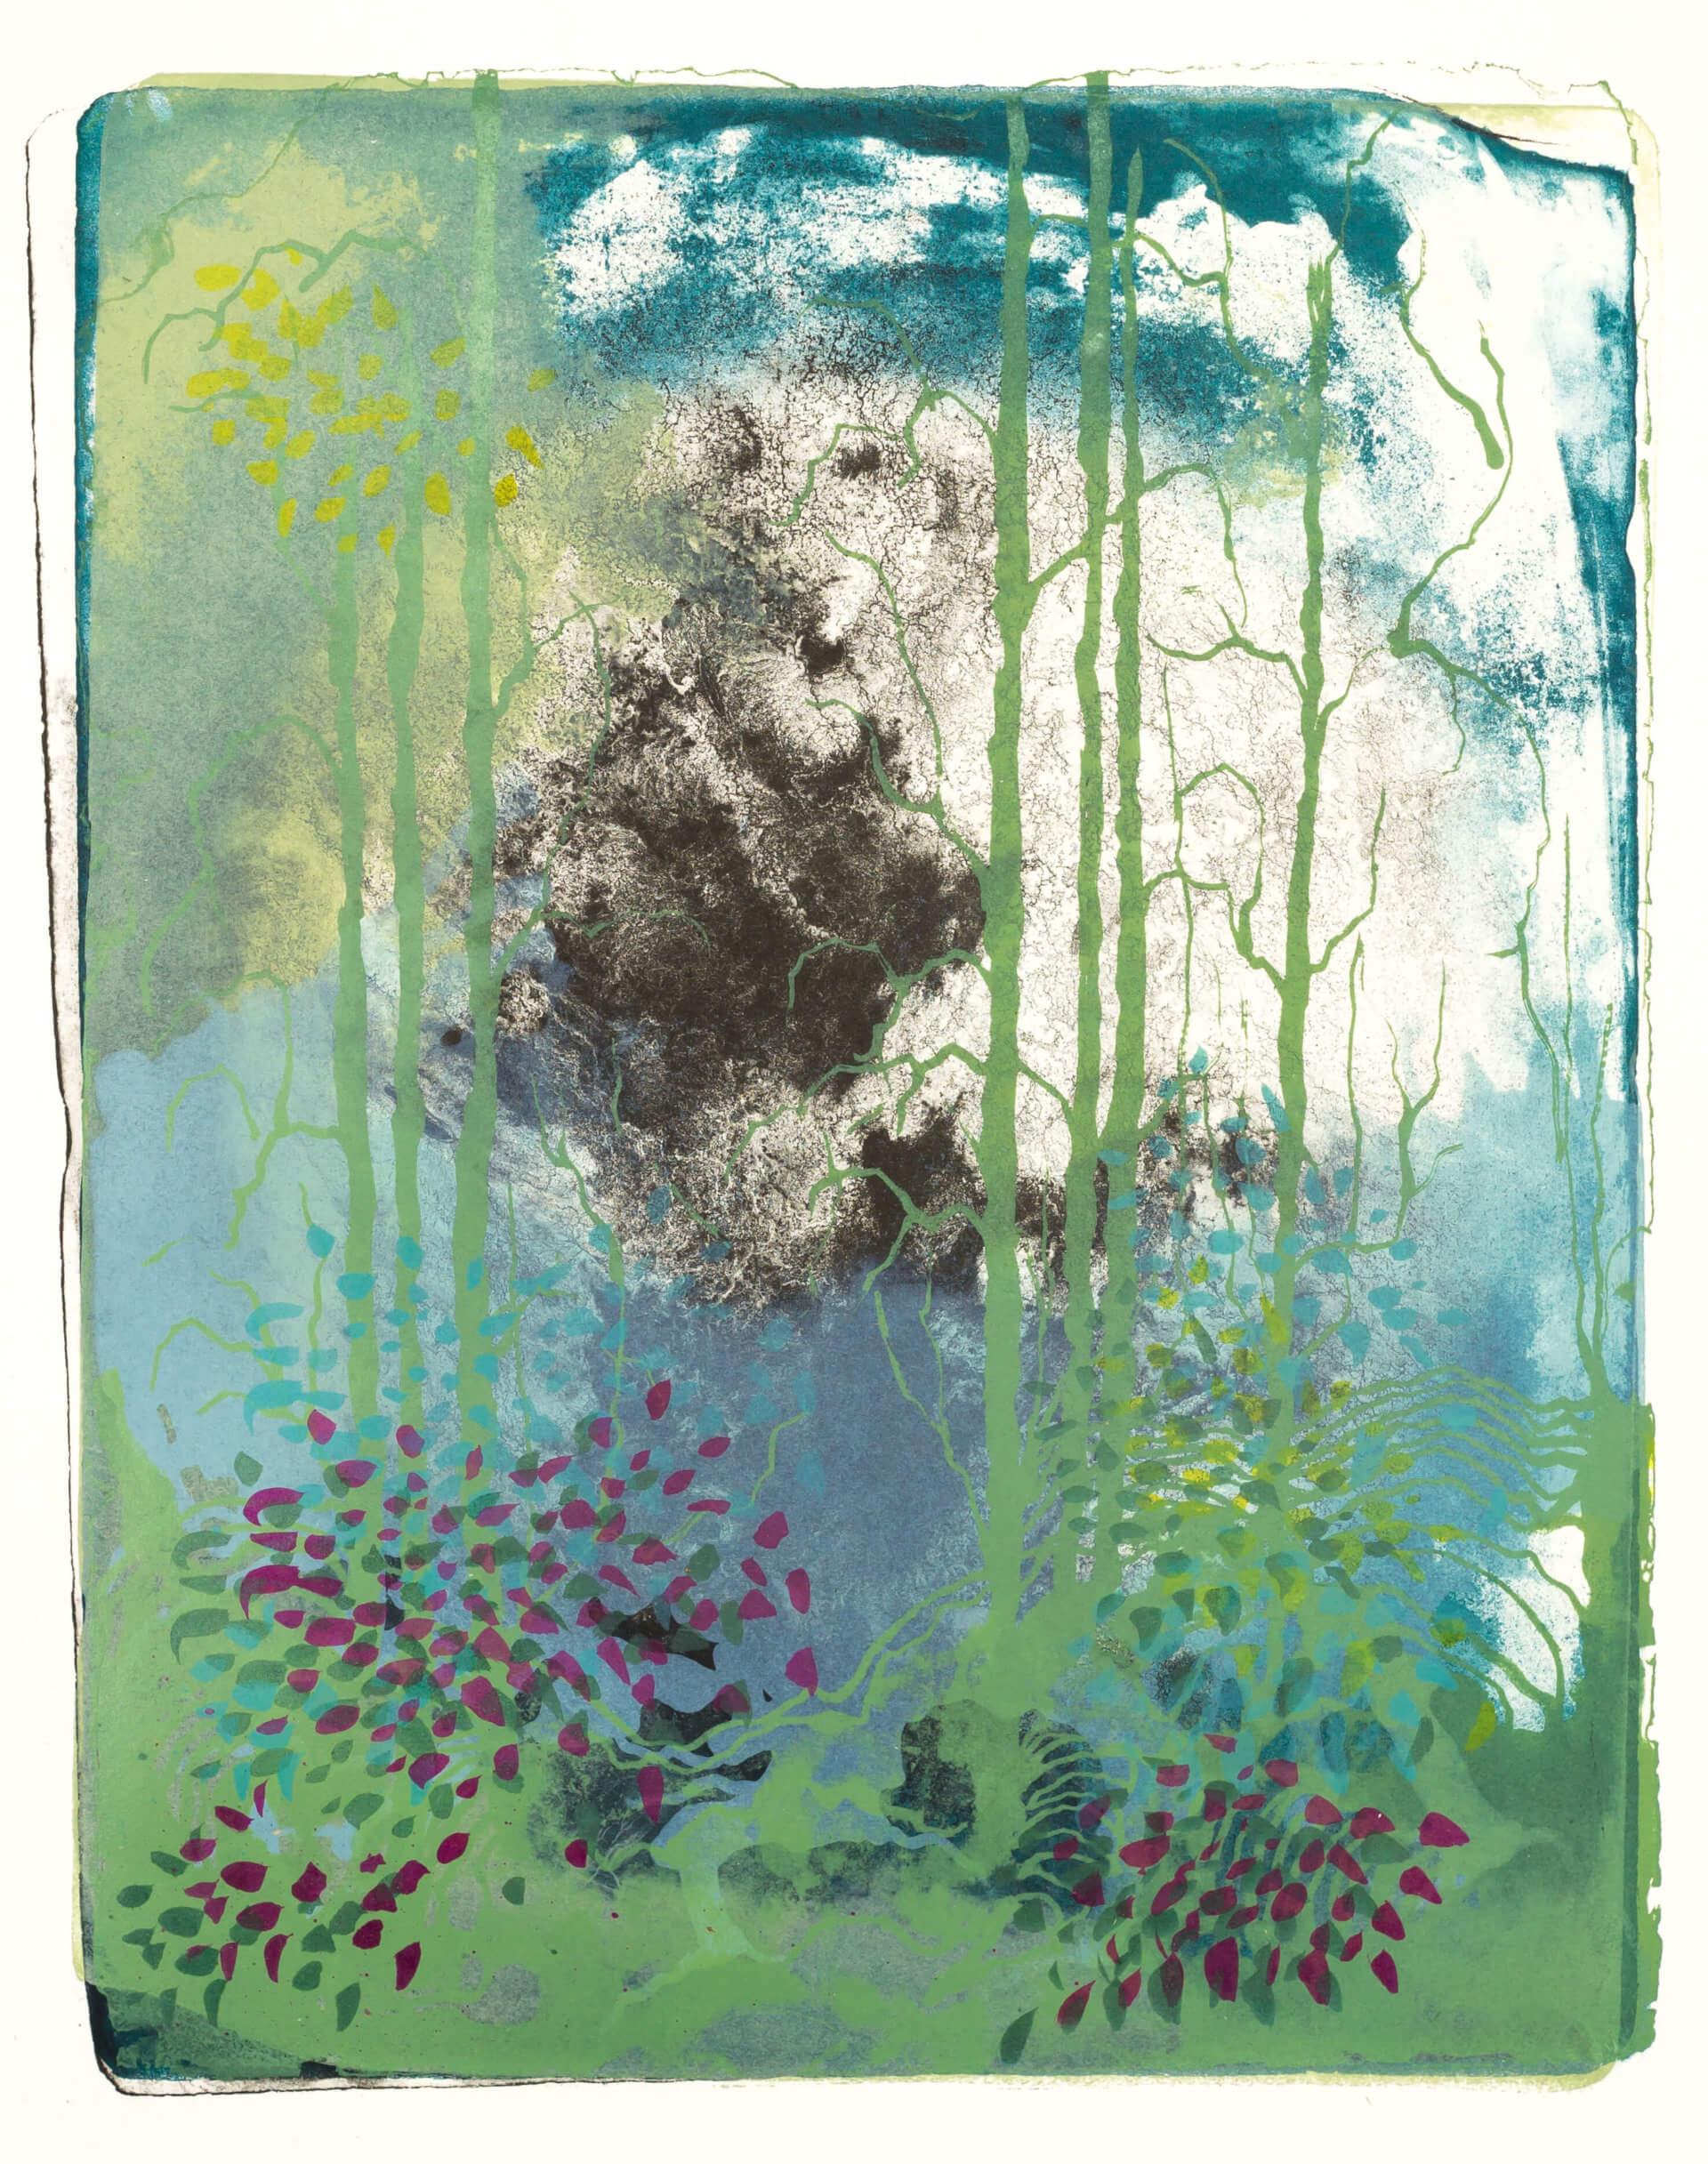 Wald X(K)-III, 2018, Farblithographie, Unikat, 50x40 cm.